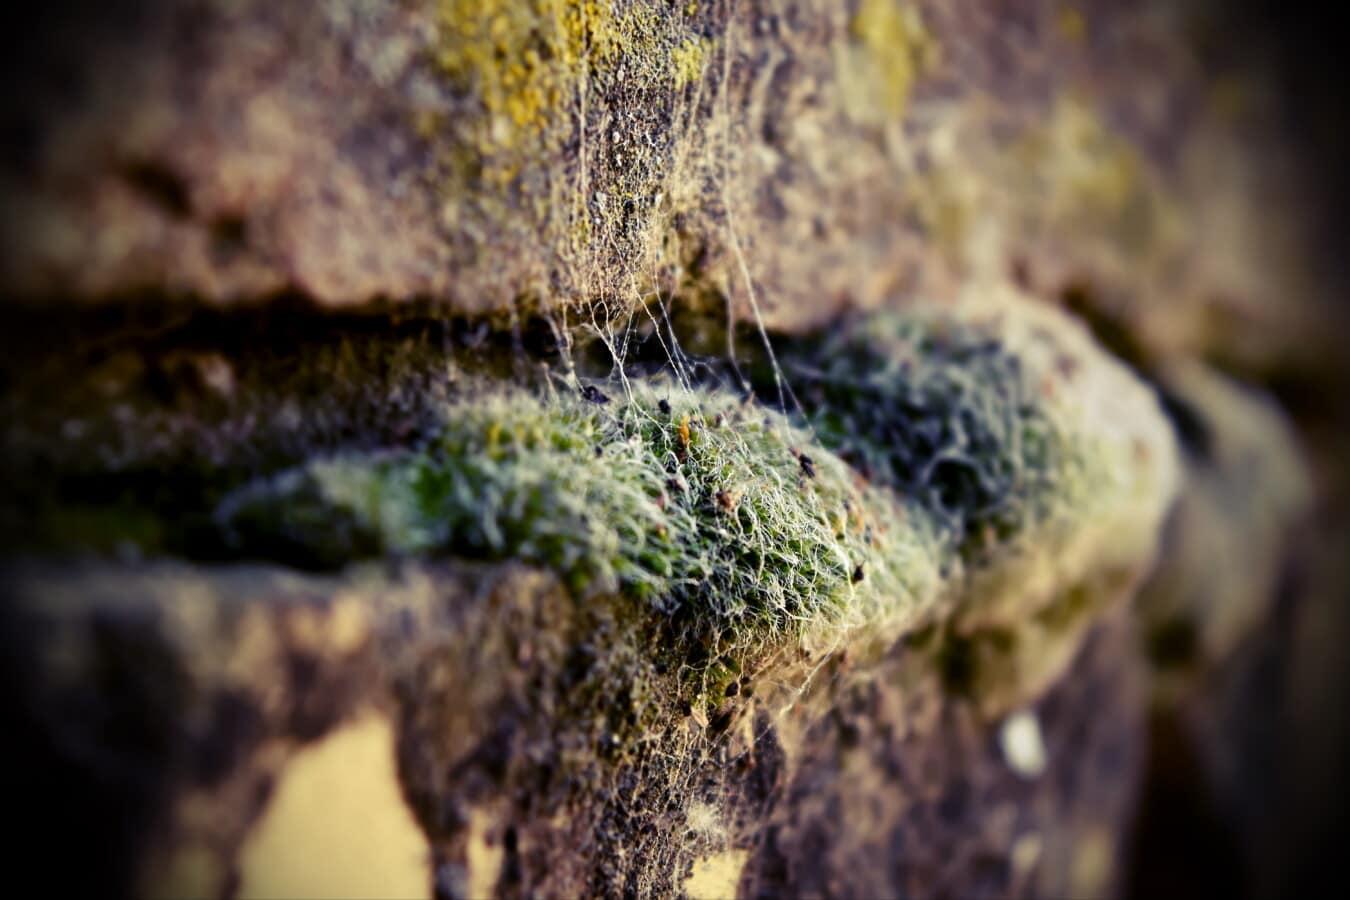 Ziegel, moosig, Flechten, aus nächster Nähe, Kraut, Organismus, Moos, Spinnennetz, Natur, Stein